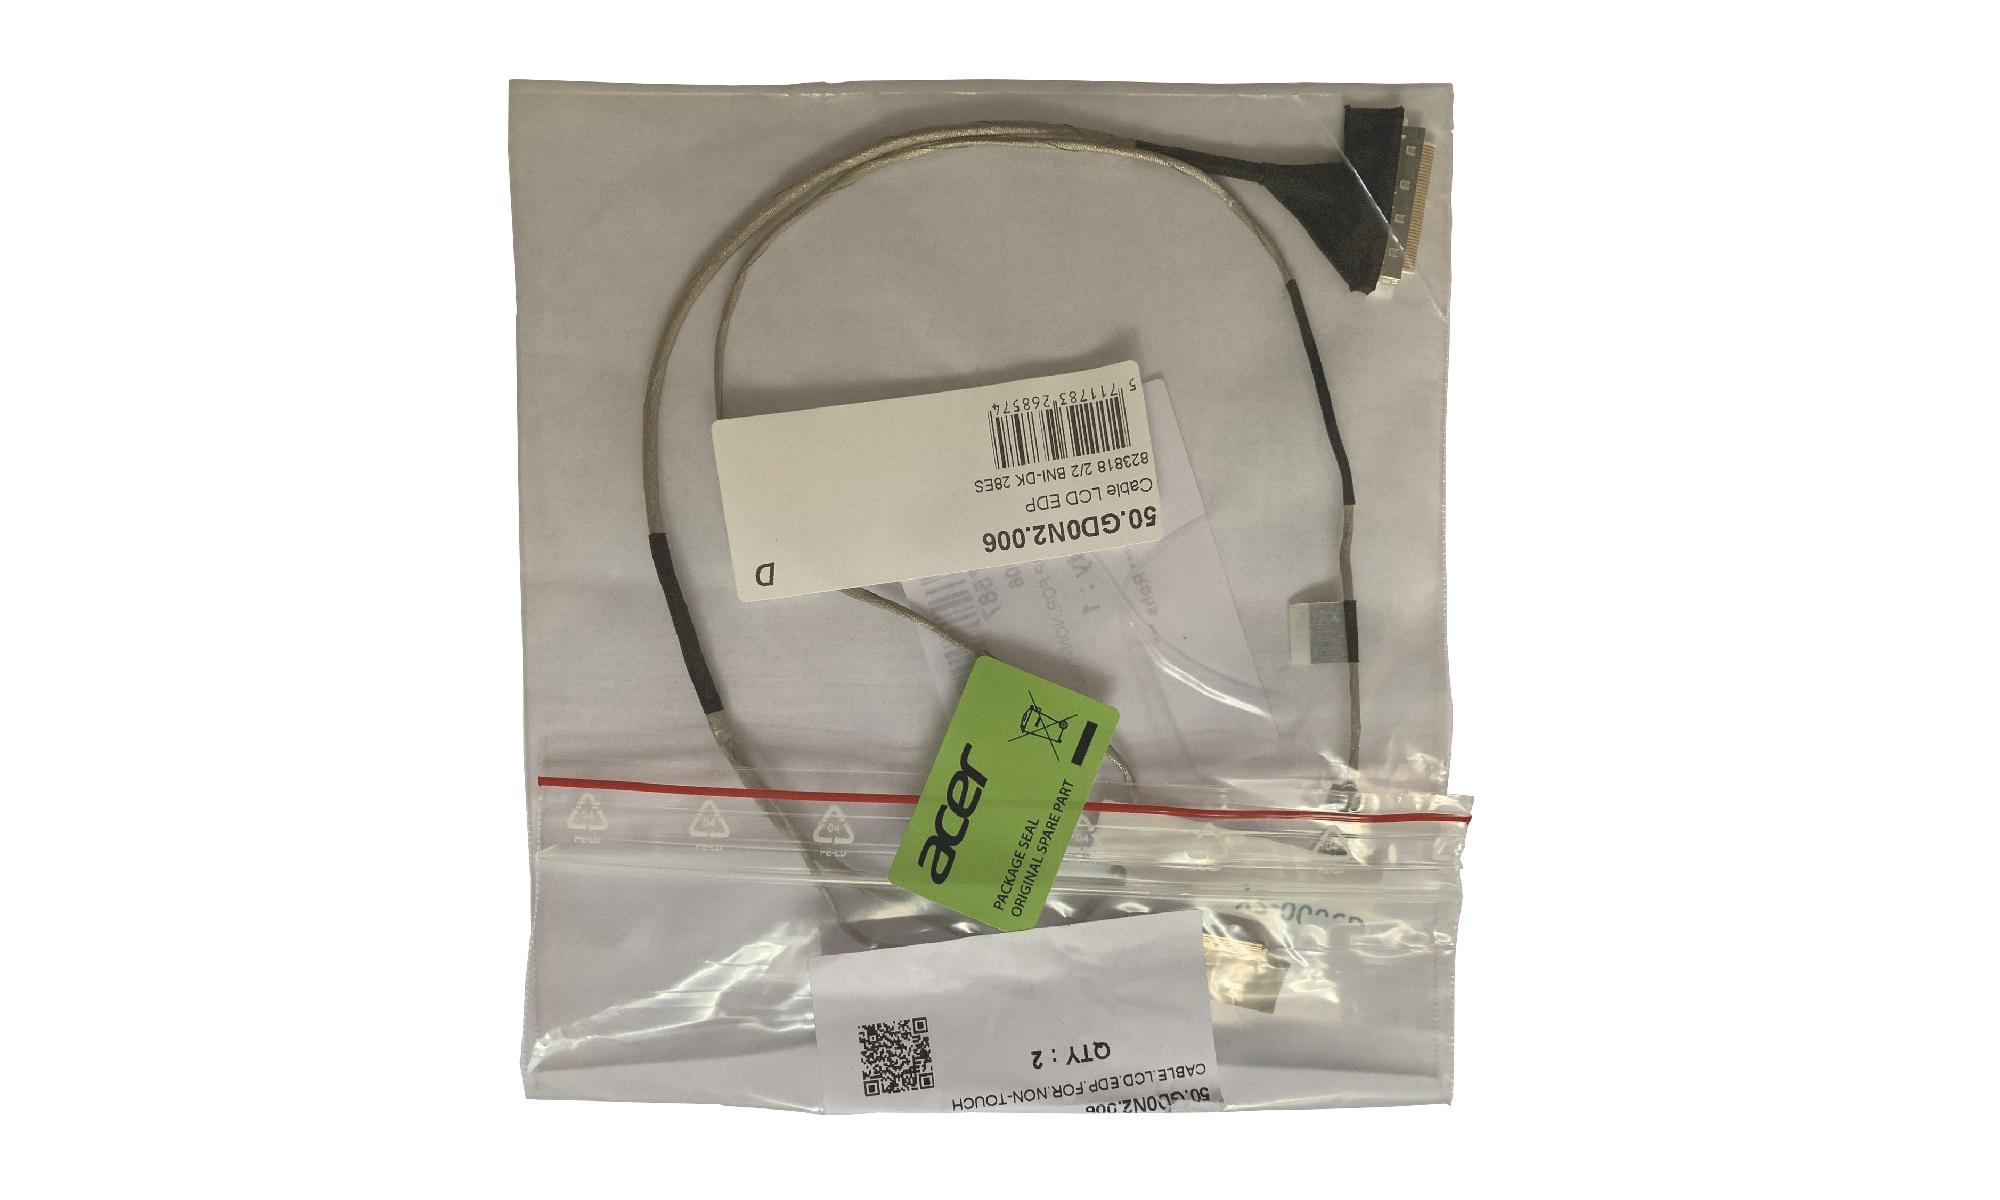 Cablu video original Acer Aspire ES1-572, pentru display nontouch